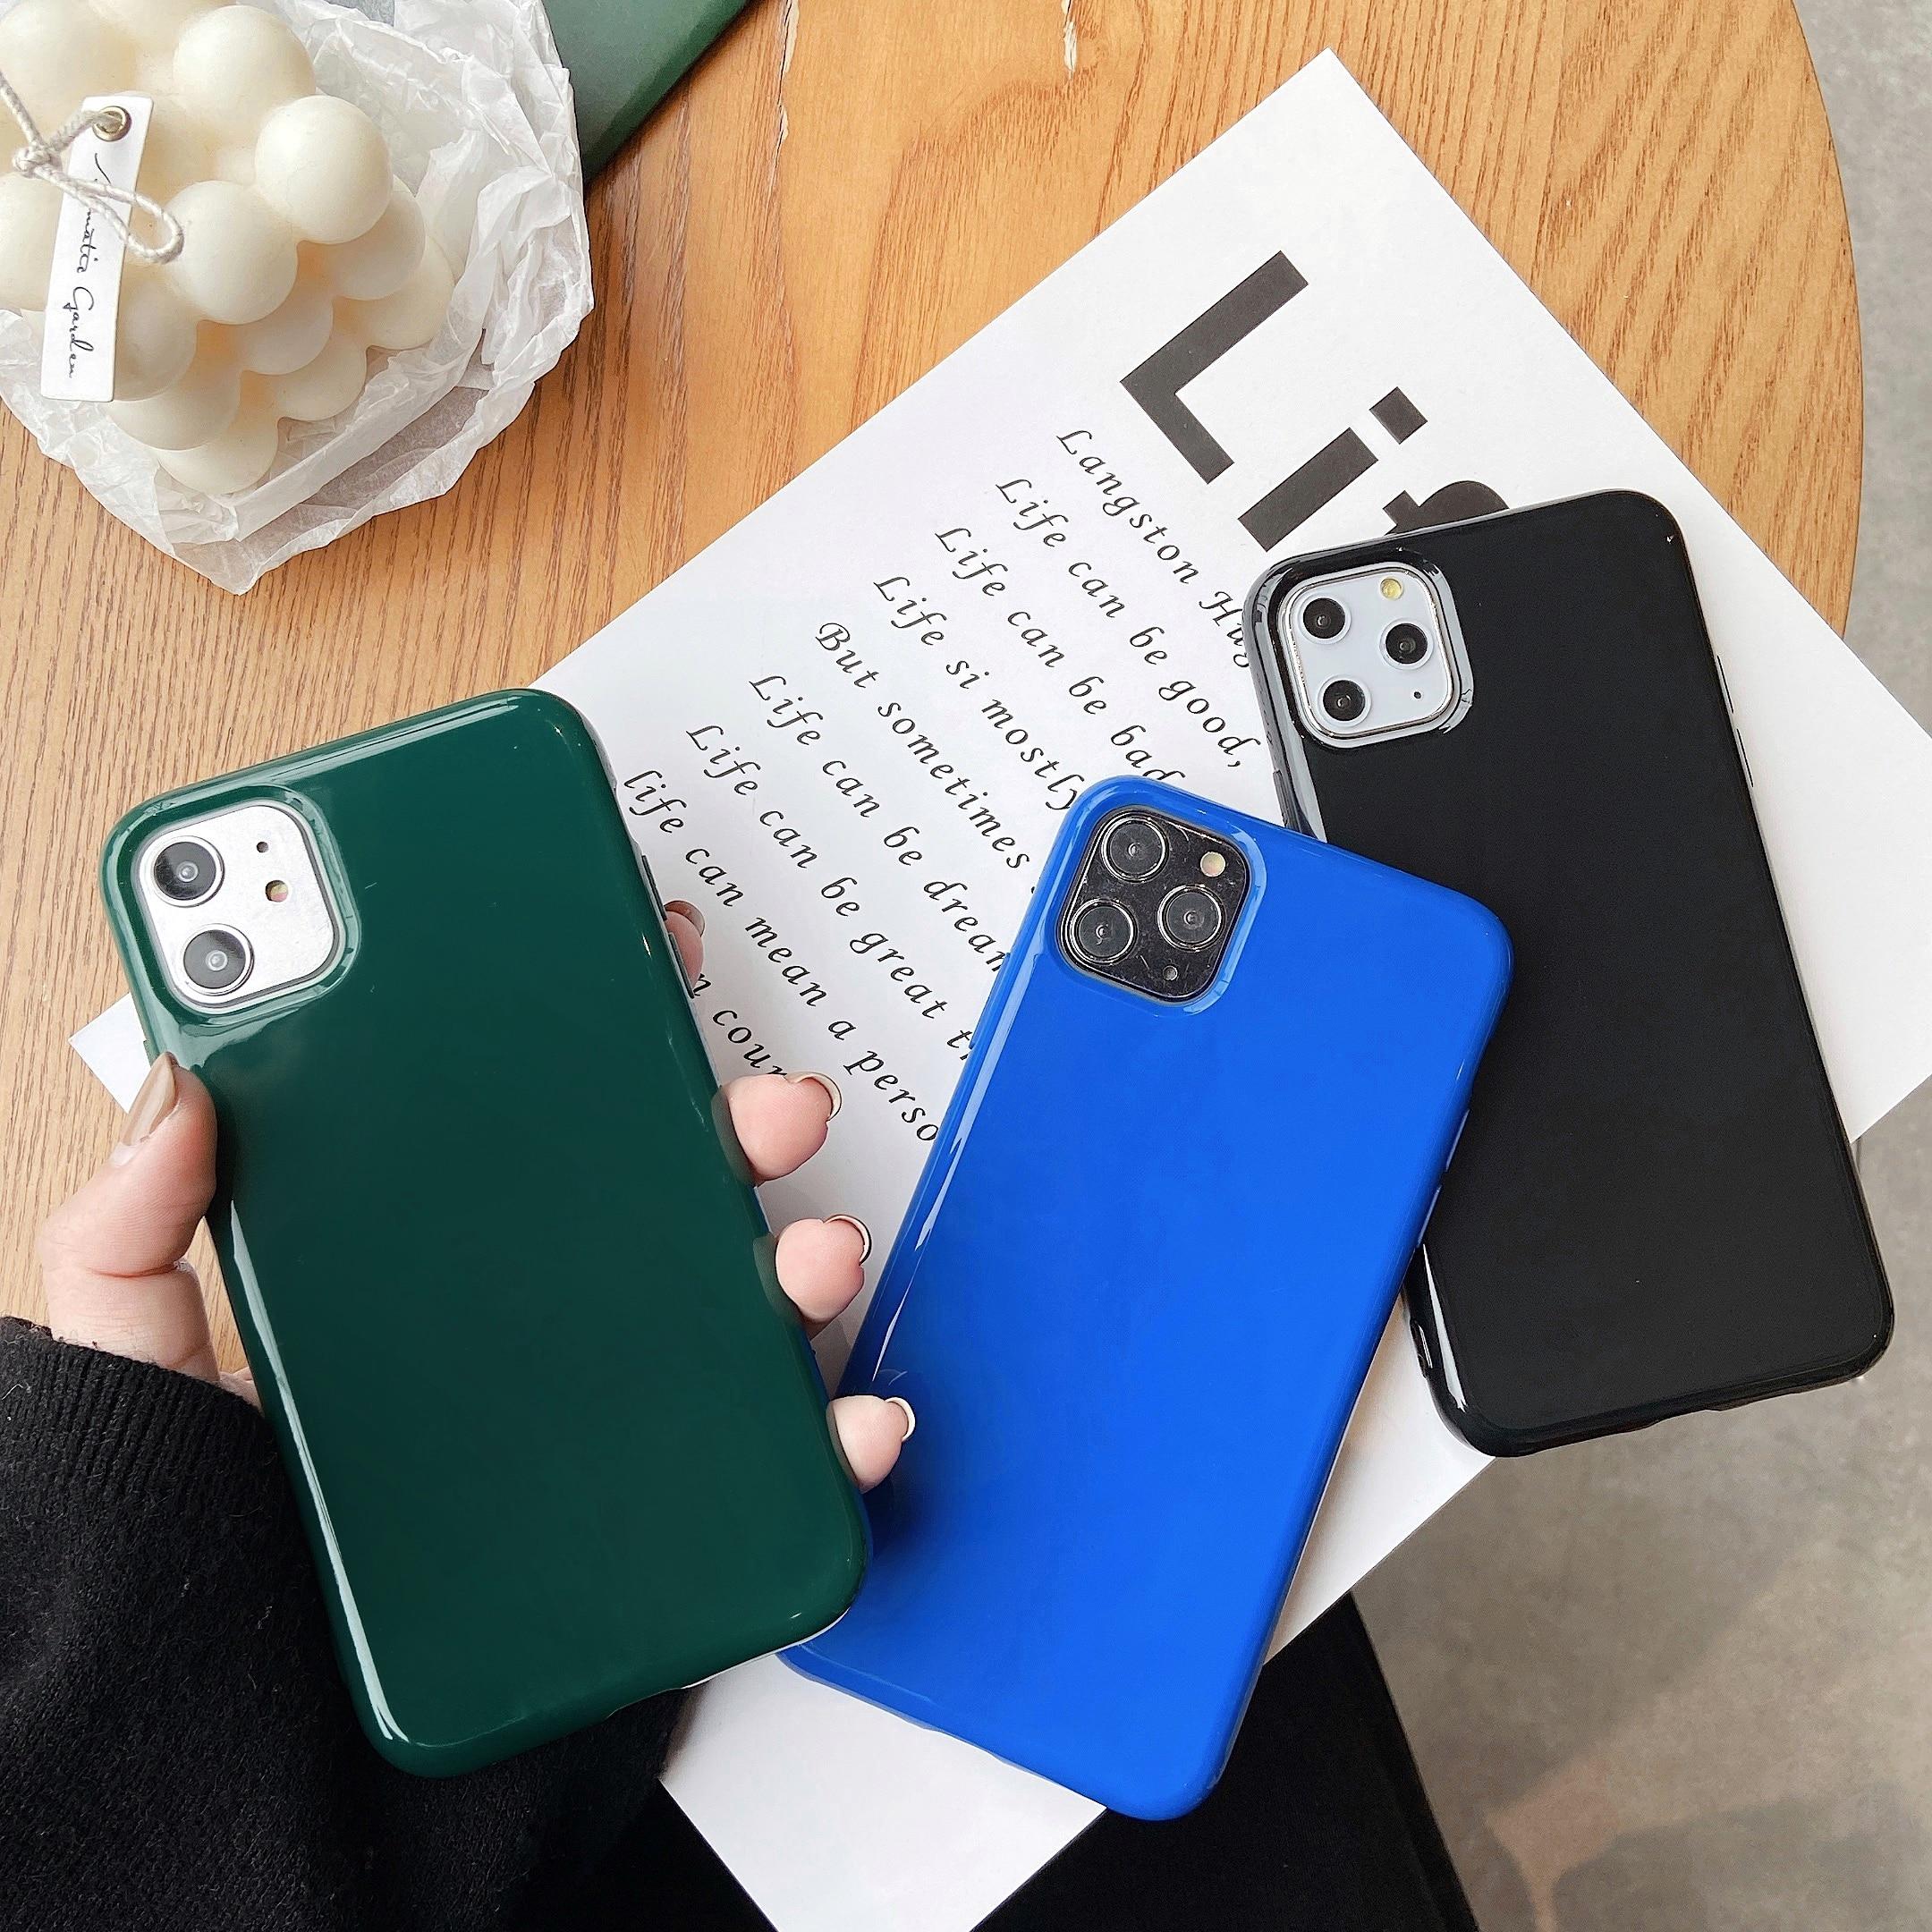 Funda de teléfono Ranipobo de Color sólido brillante grueso suave para iPhone 11 Pro XR XS X XS Max 7 8 6 6S Plus, carcasa de teléfono de moda